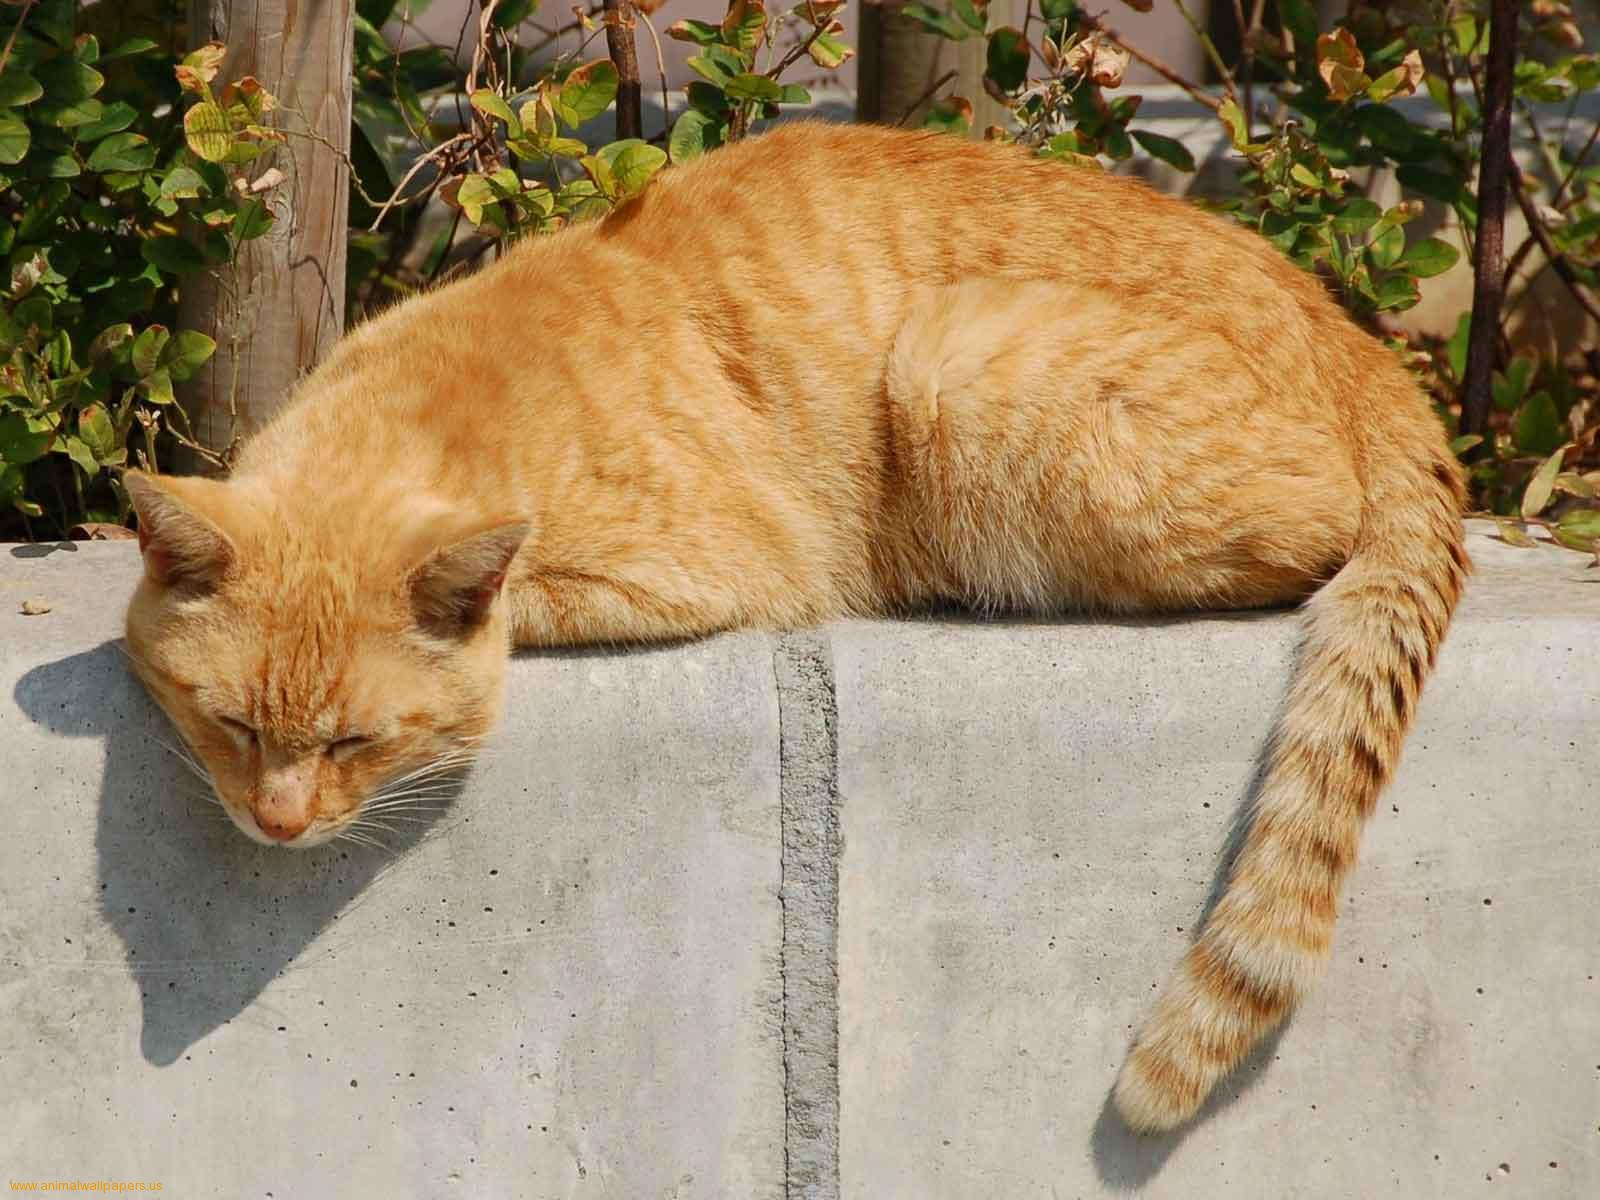 catsneedcare http://catsneedcare.com/cat-has-bent-tail/